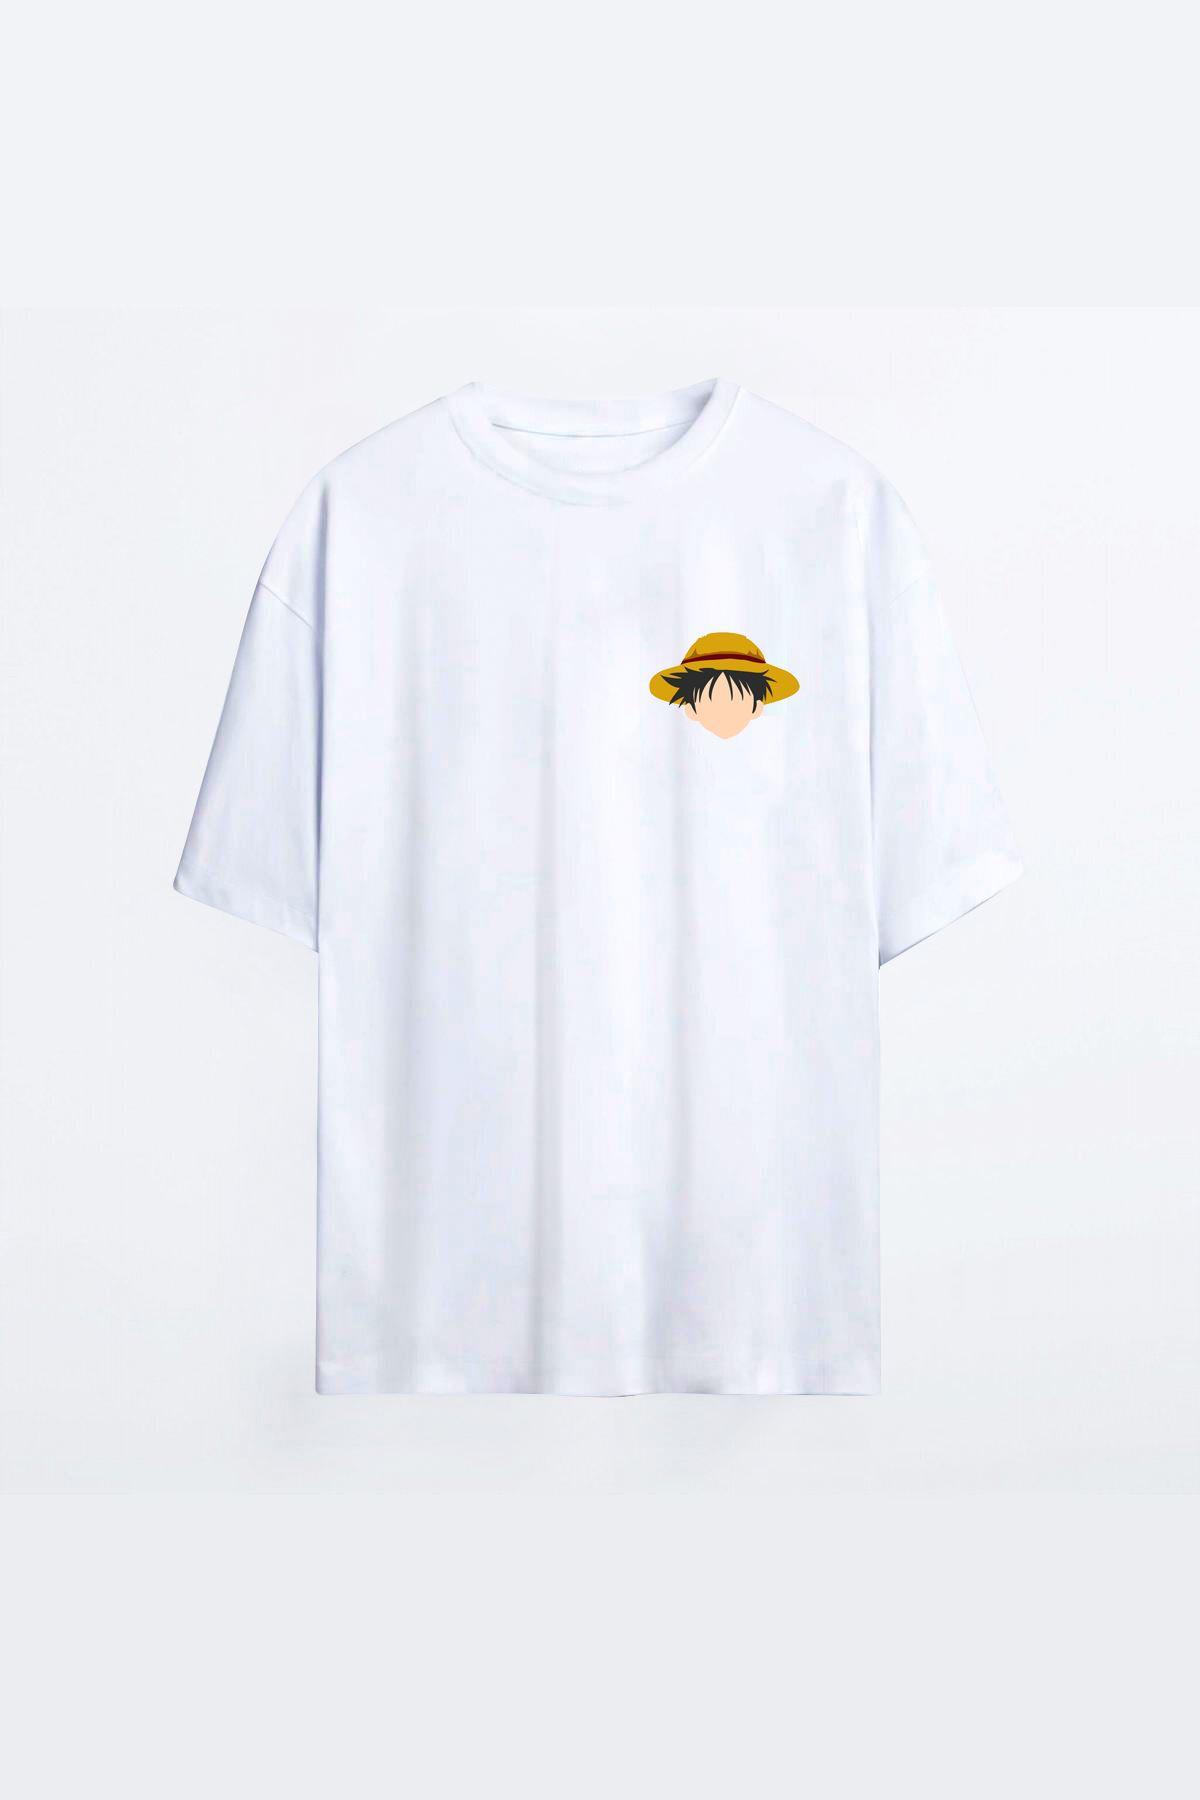 One Piece Luffy Beyaz Erkek Oversize Tshirt - Tişört